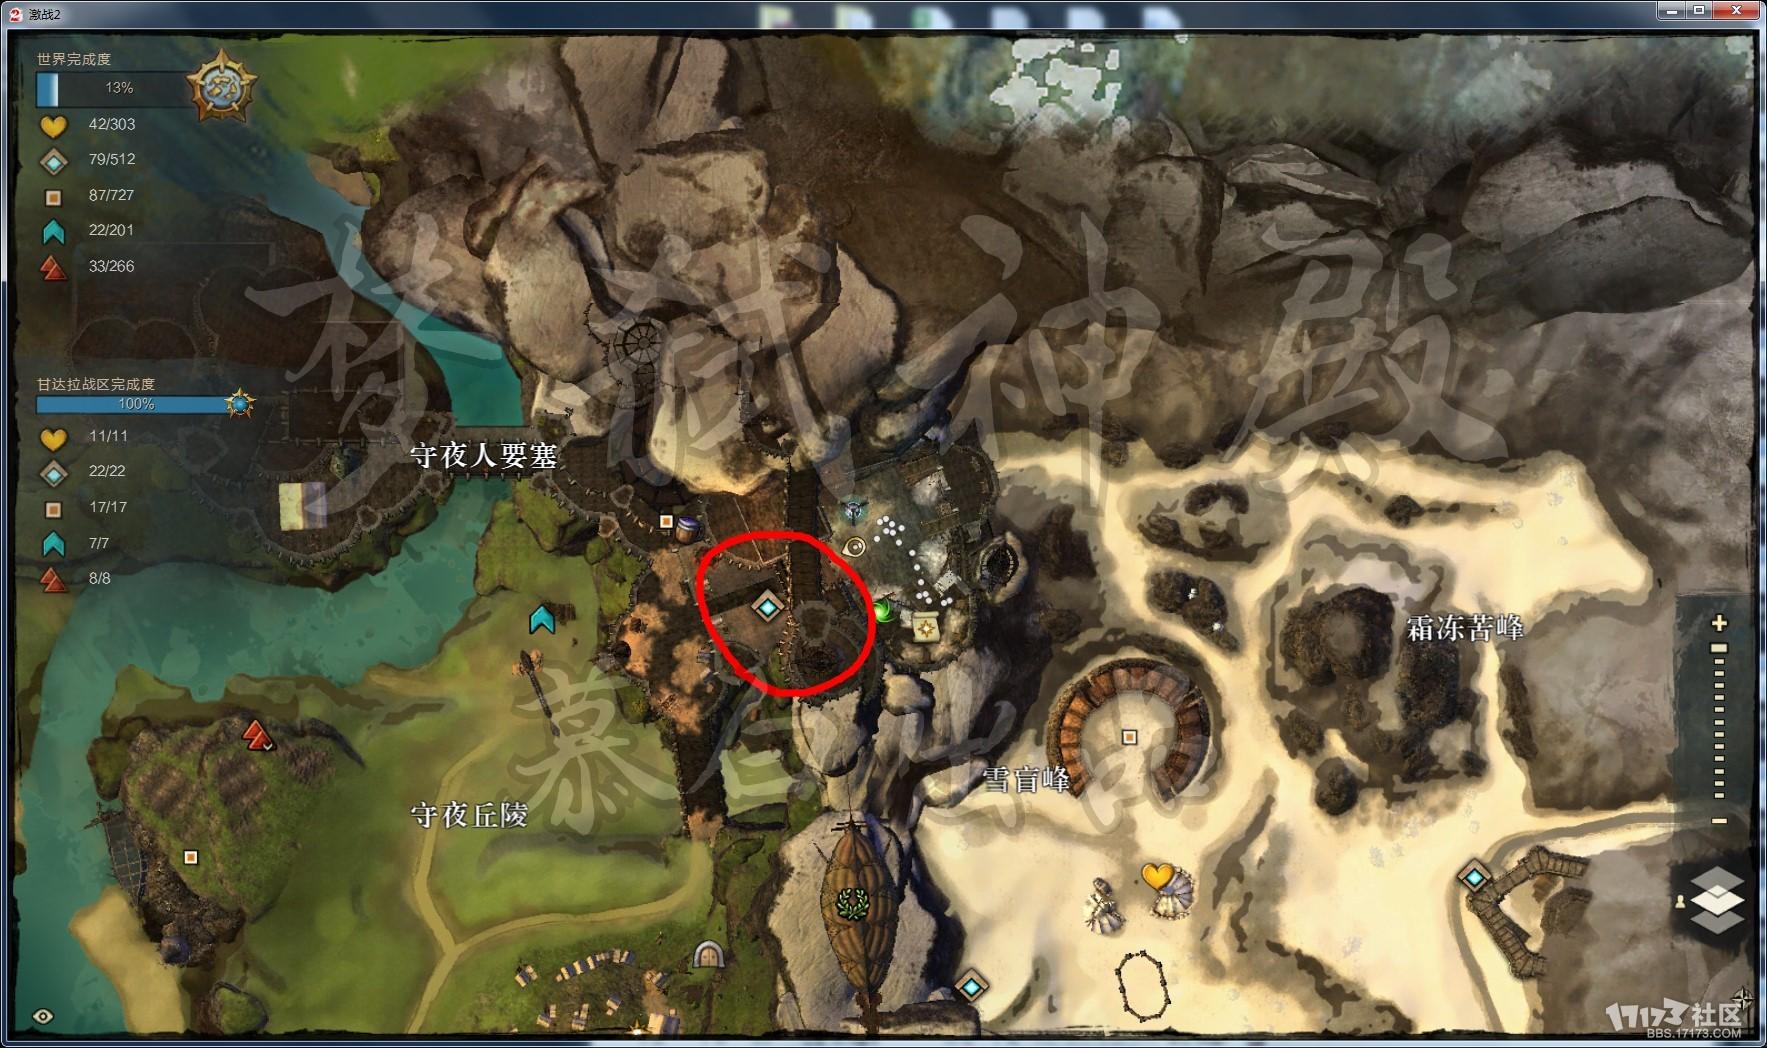 Gandala战区:Guild Wars 2 Gandala战区,以太剑跳动了那支钢管舞